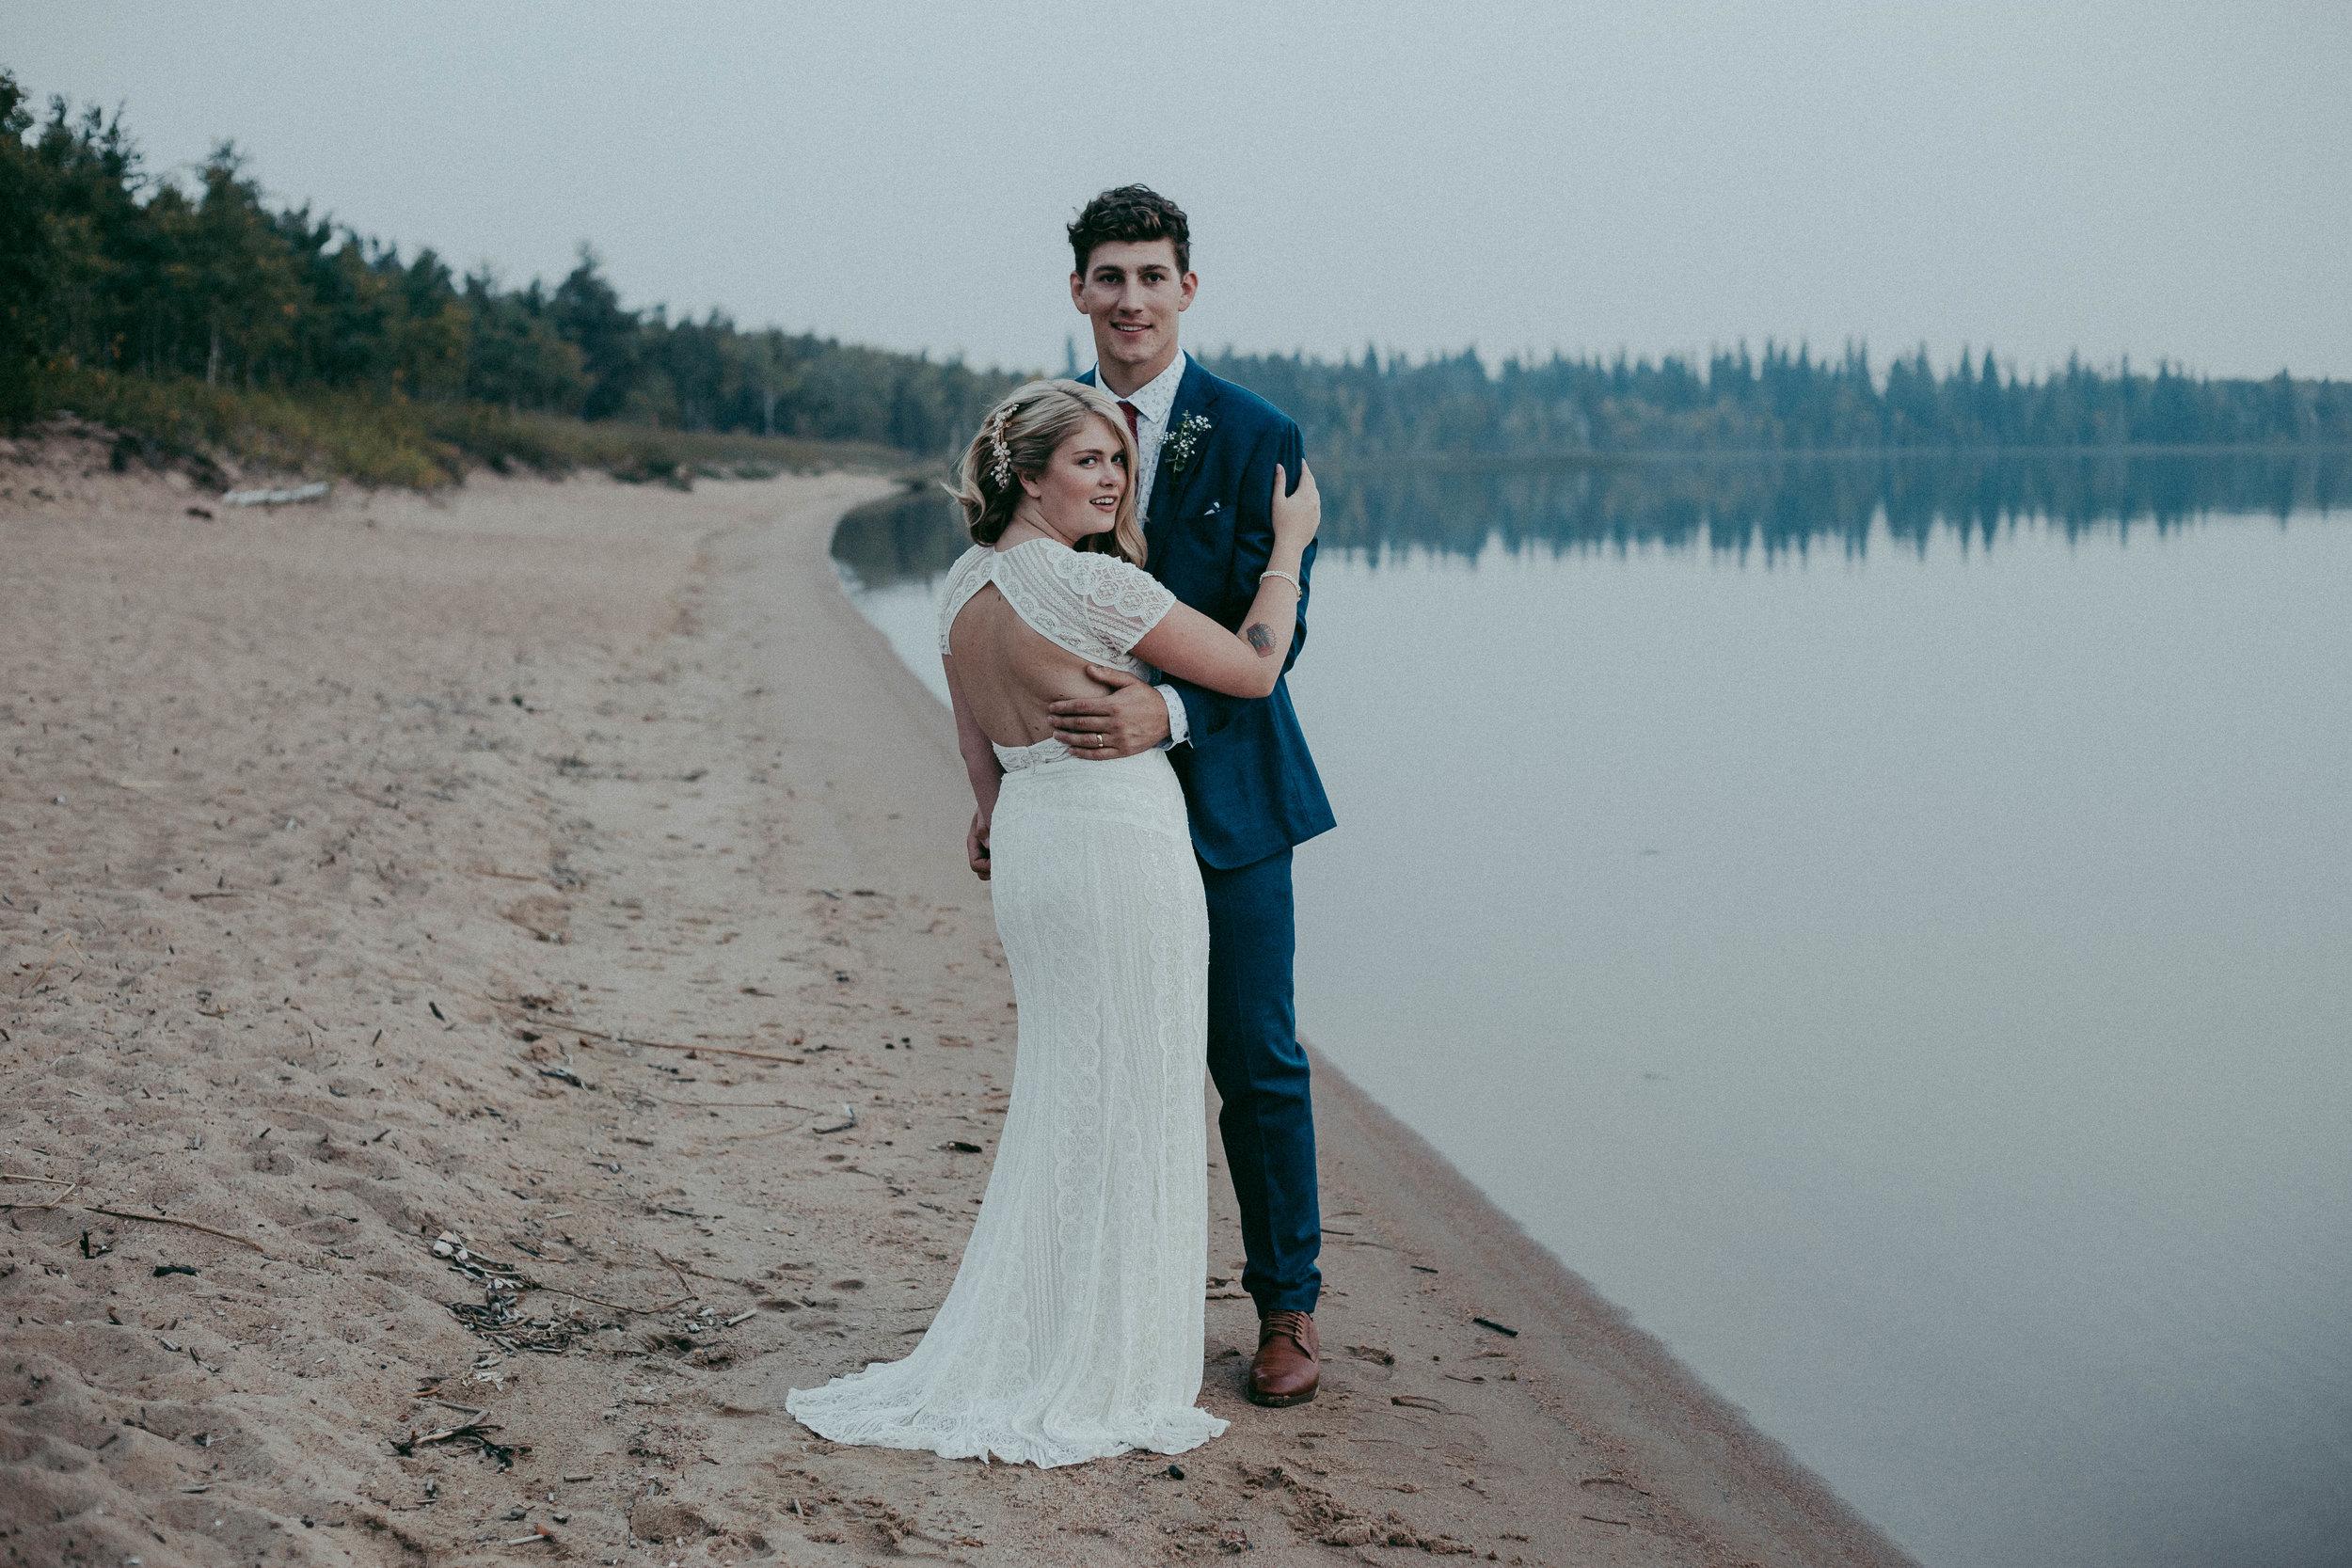 Travelling Edmonton photographer Lindsay mills